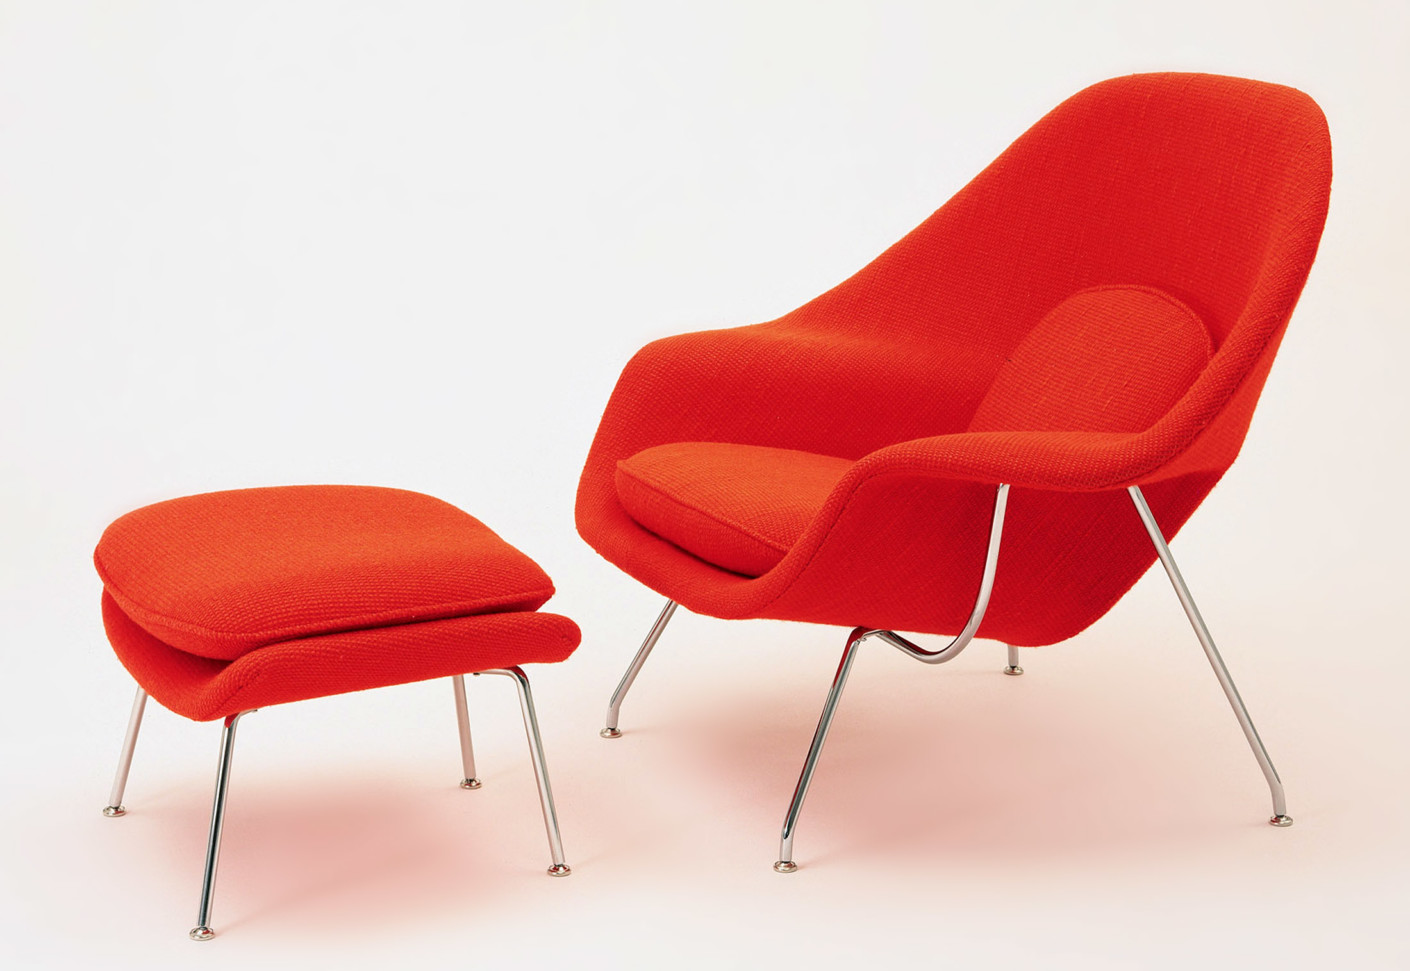 saarinen womb chair von knoll stylepark. Black Bedroom Furniture Sets. Home Design Ideas